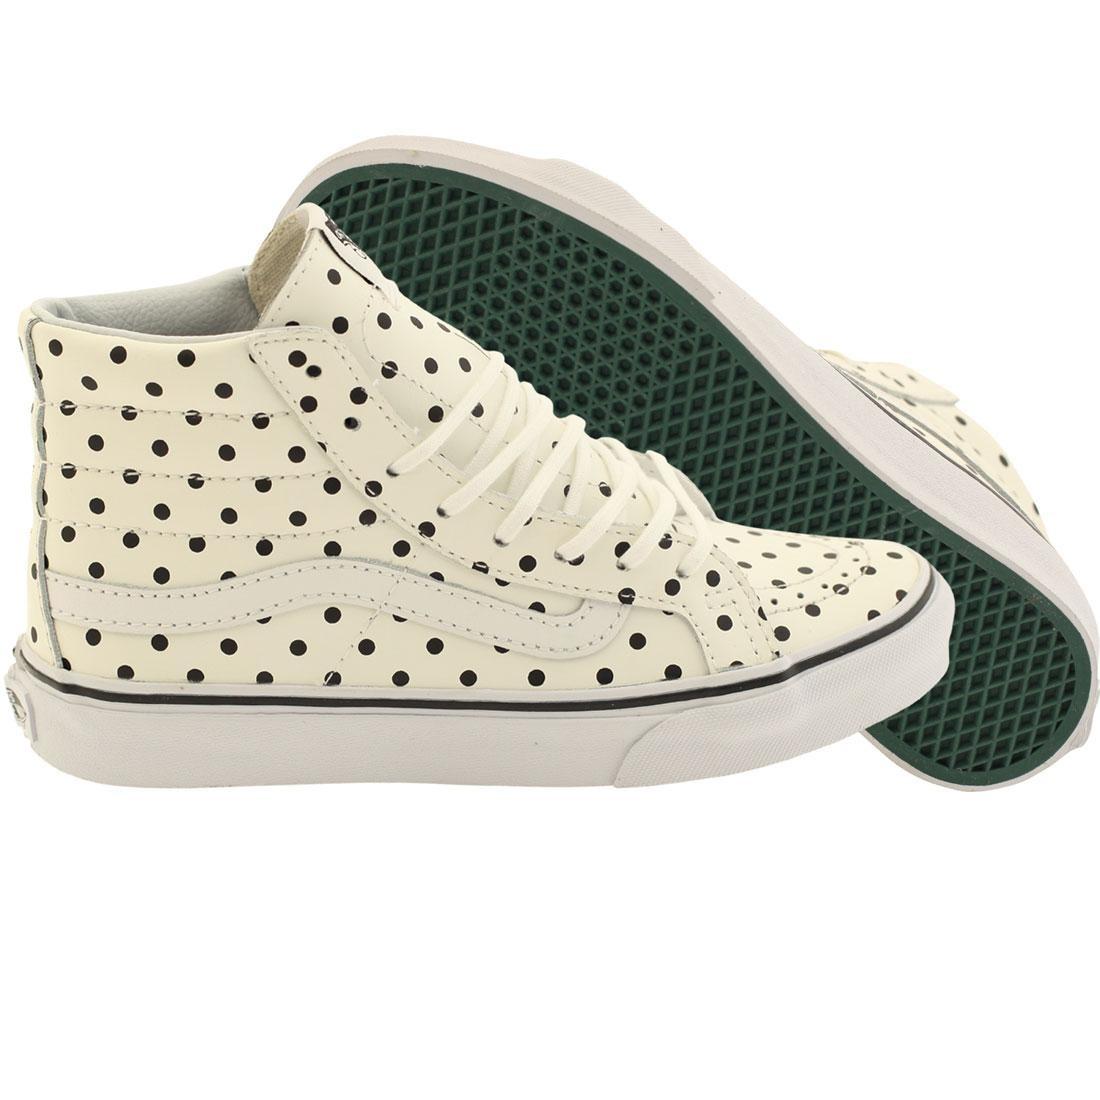 Vans Women Sk8-Hi Slim - Leather Polka Dots (white)